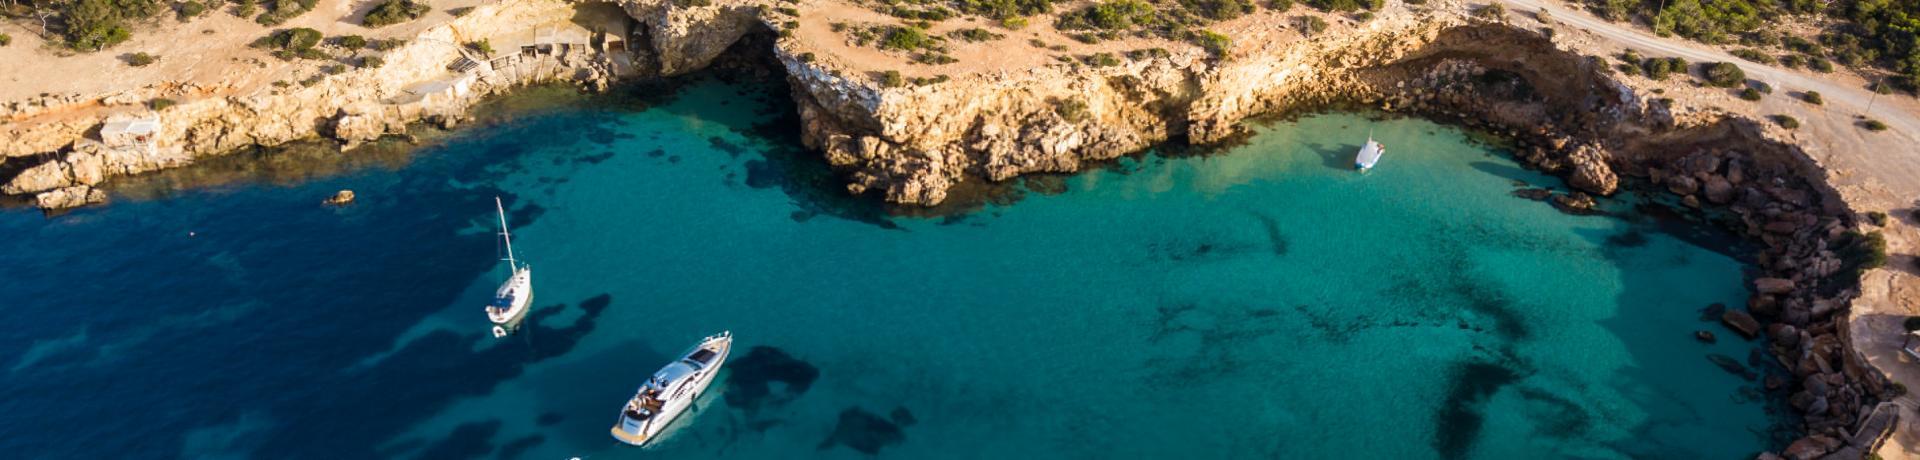 Spanien-Ibiza-Emotion_GI-874492720.jpg